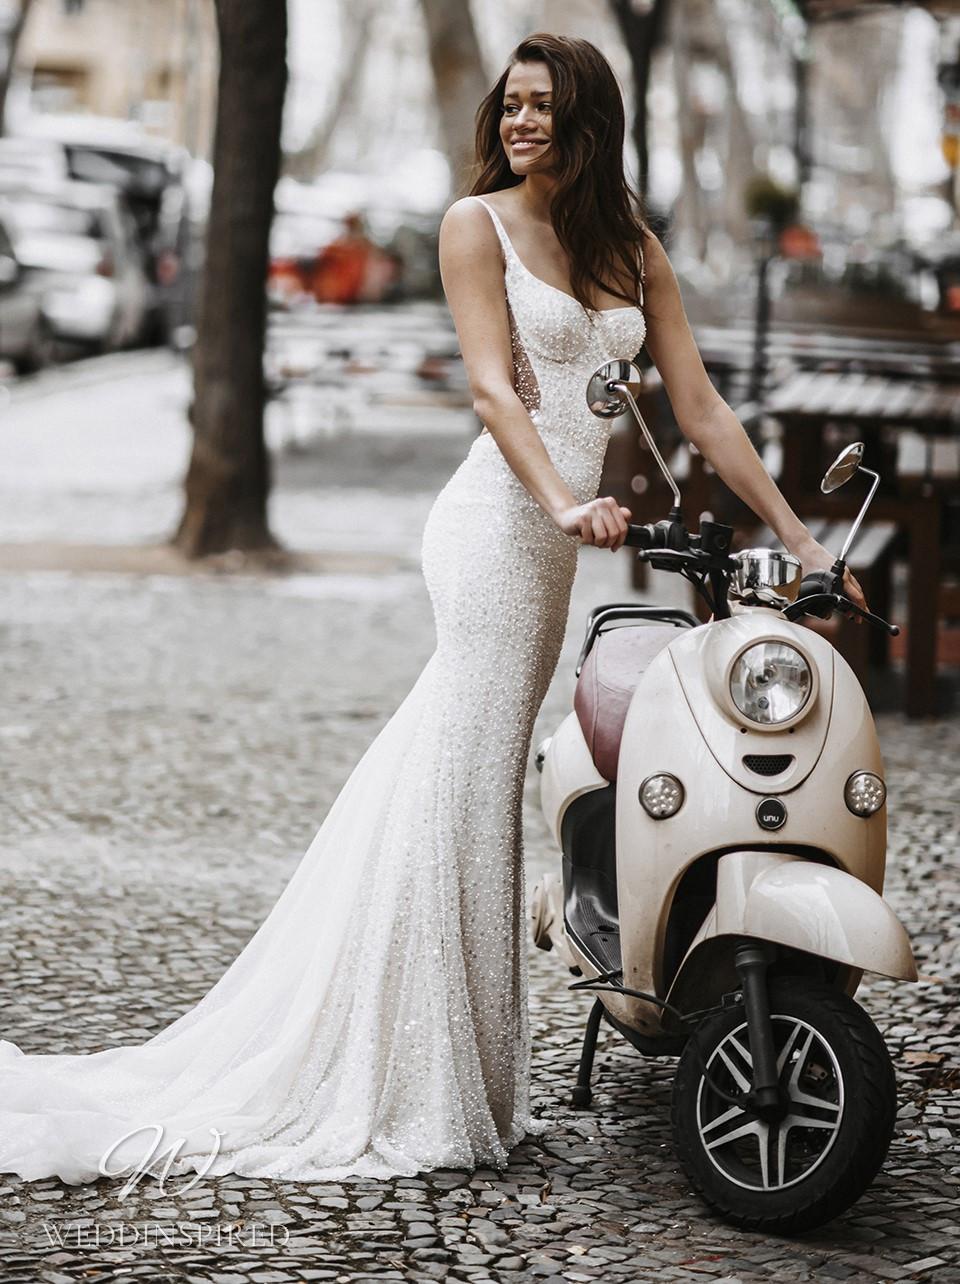 A Galia Lahav 2022 sparkly mermaid wedding dress with straps